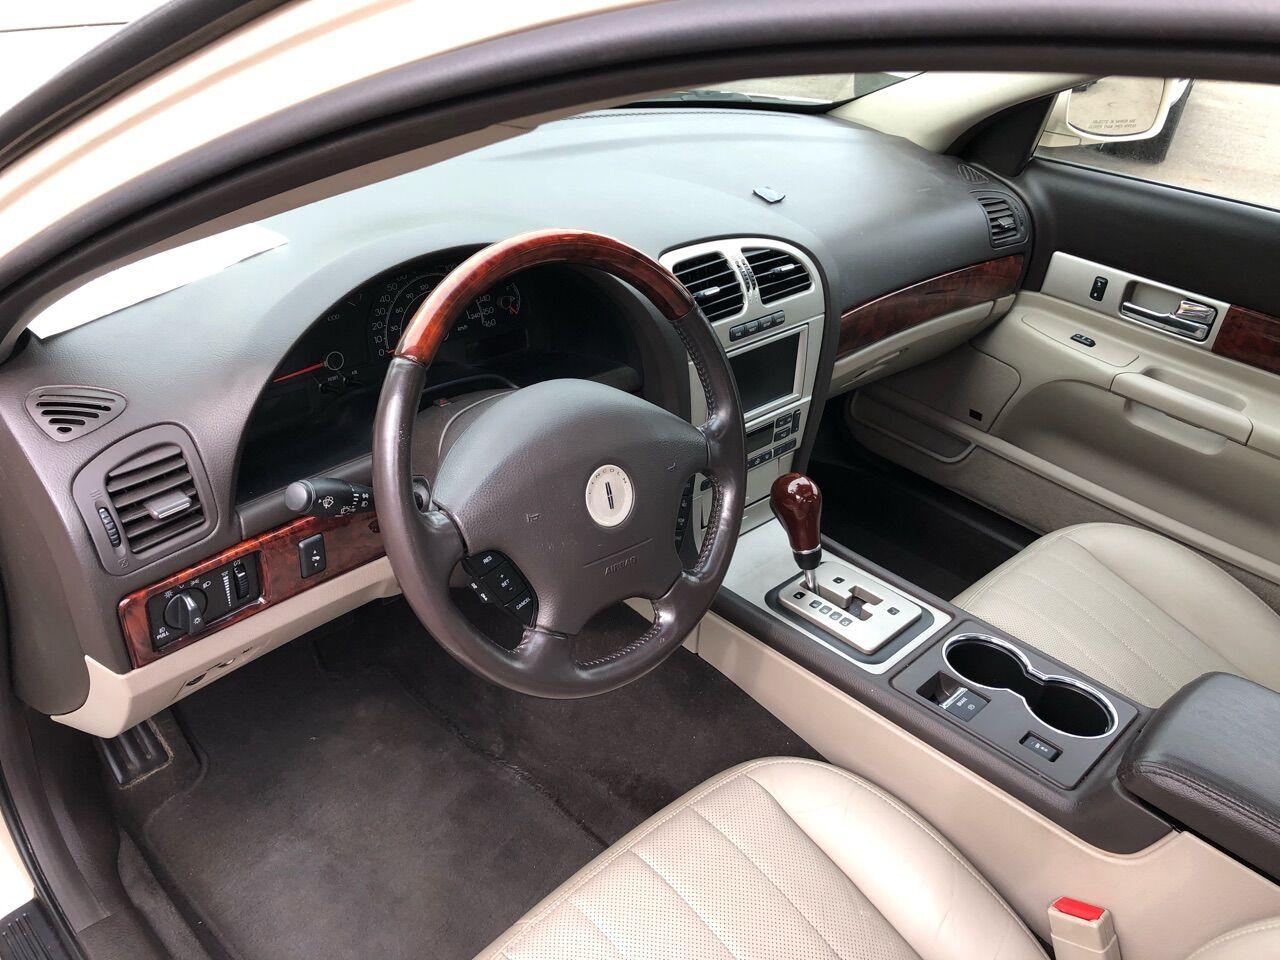 2003 Lincoln LS 4dr Car